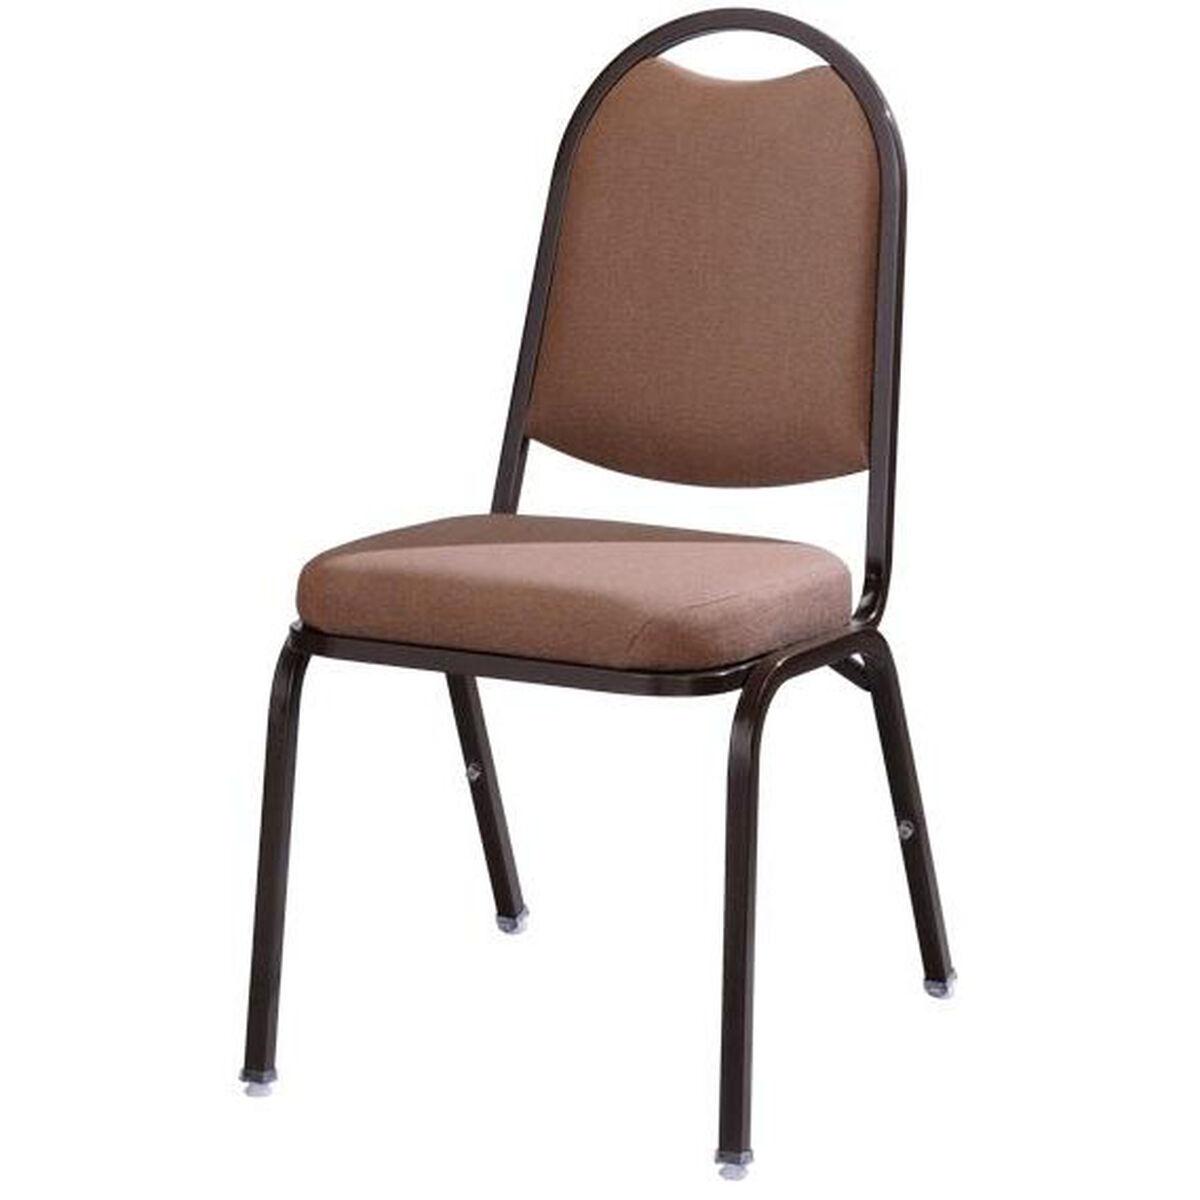 mts seating alpha stack chair 505. Black Bedroom Furniture Sets. Home Design Ideas